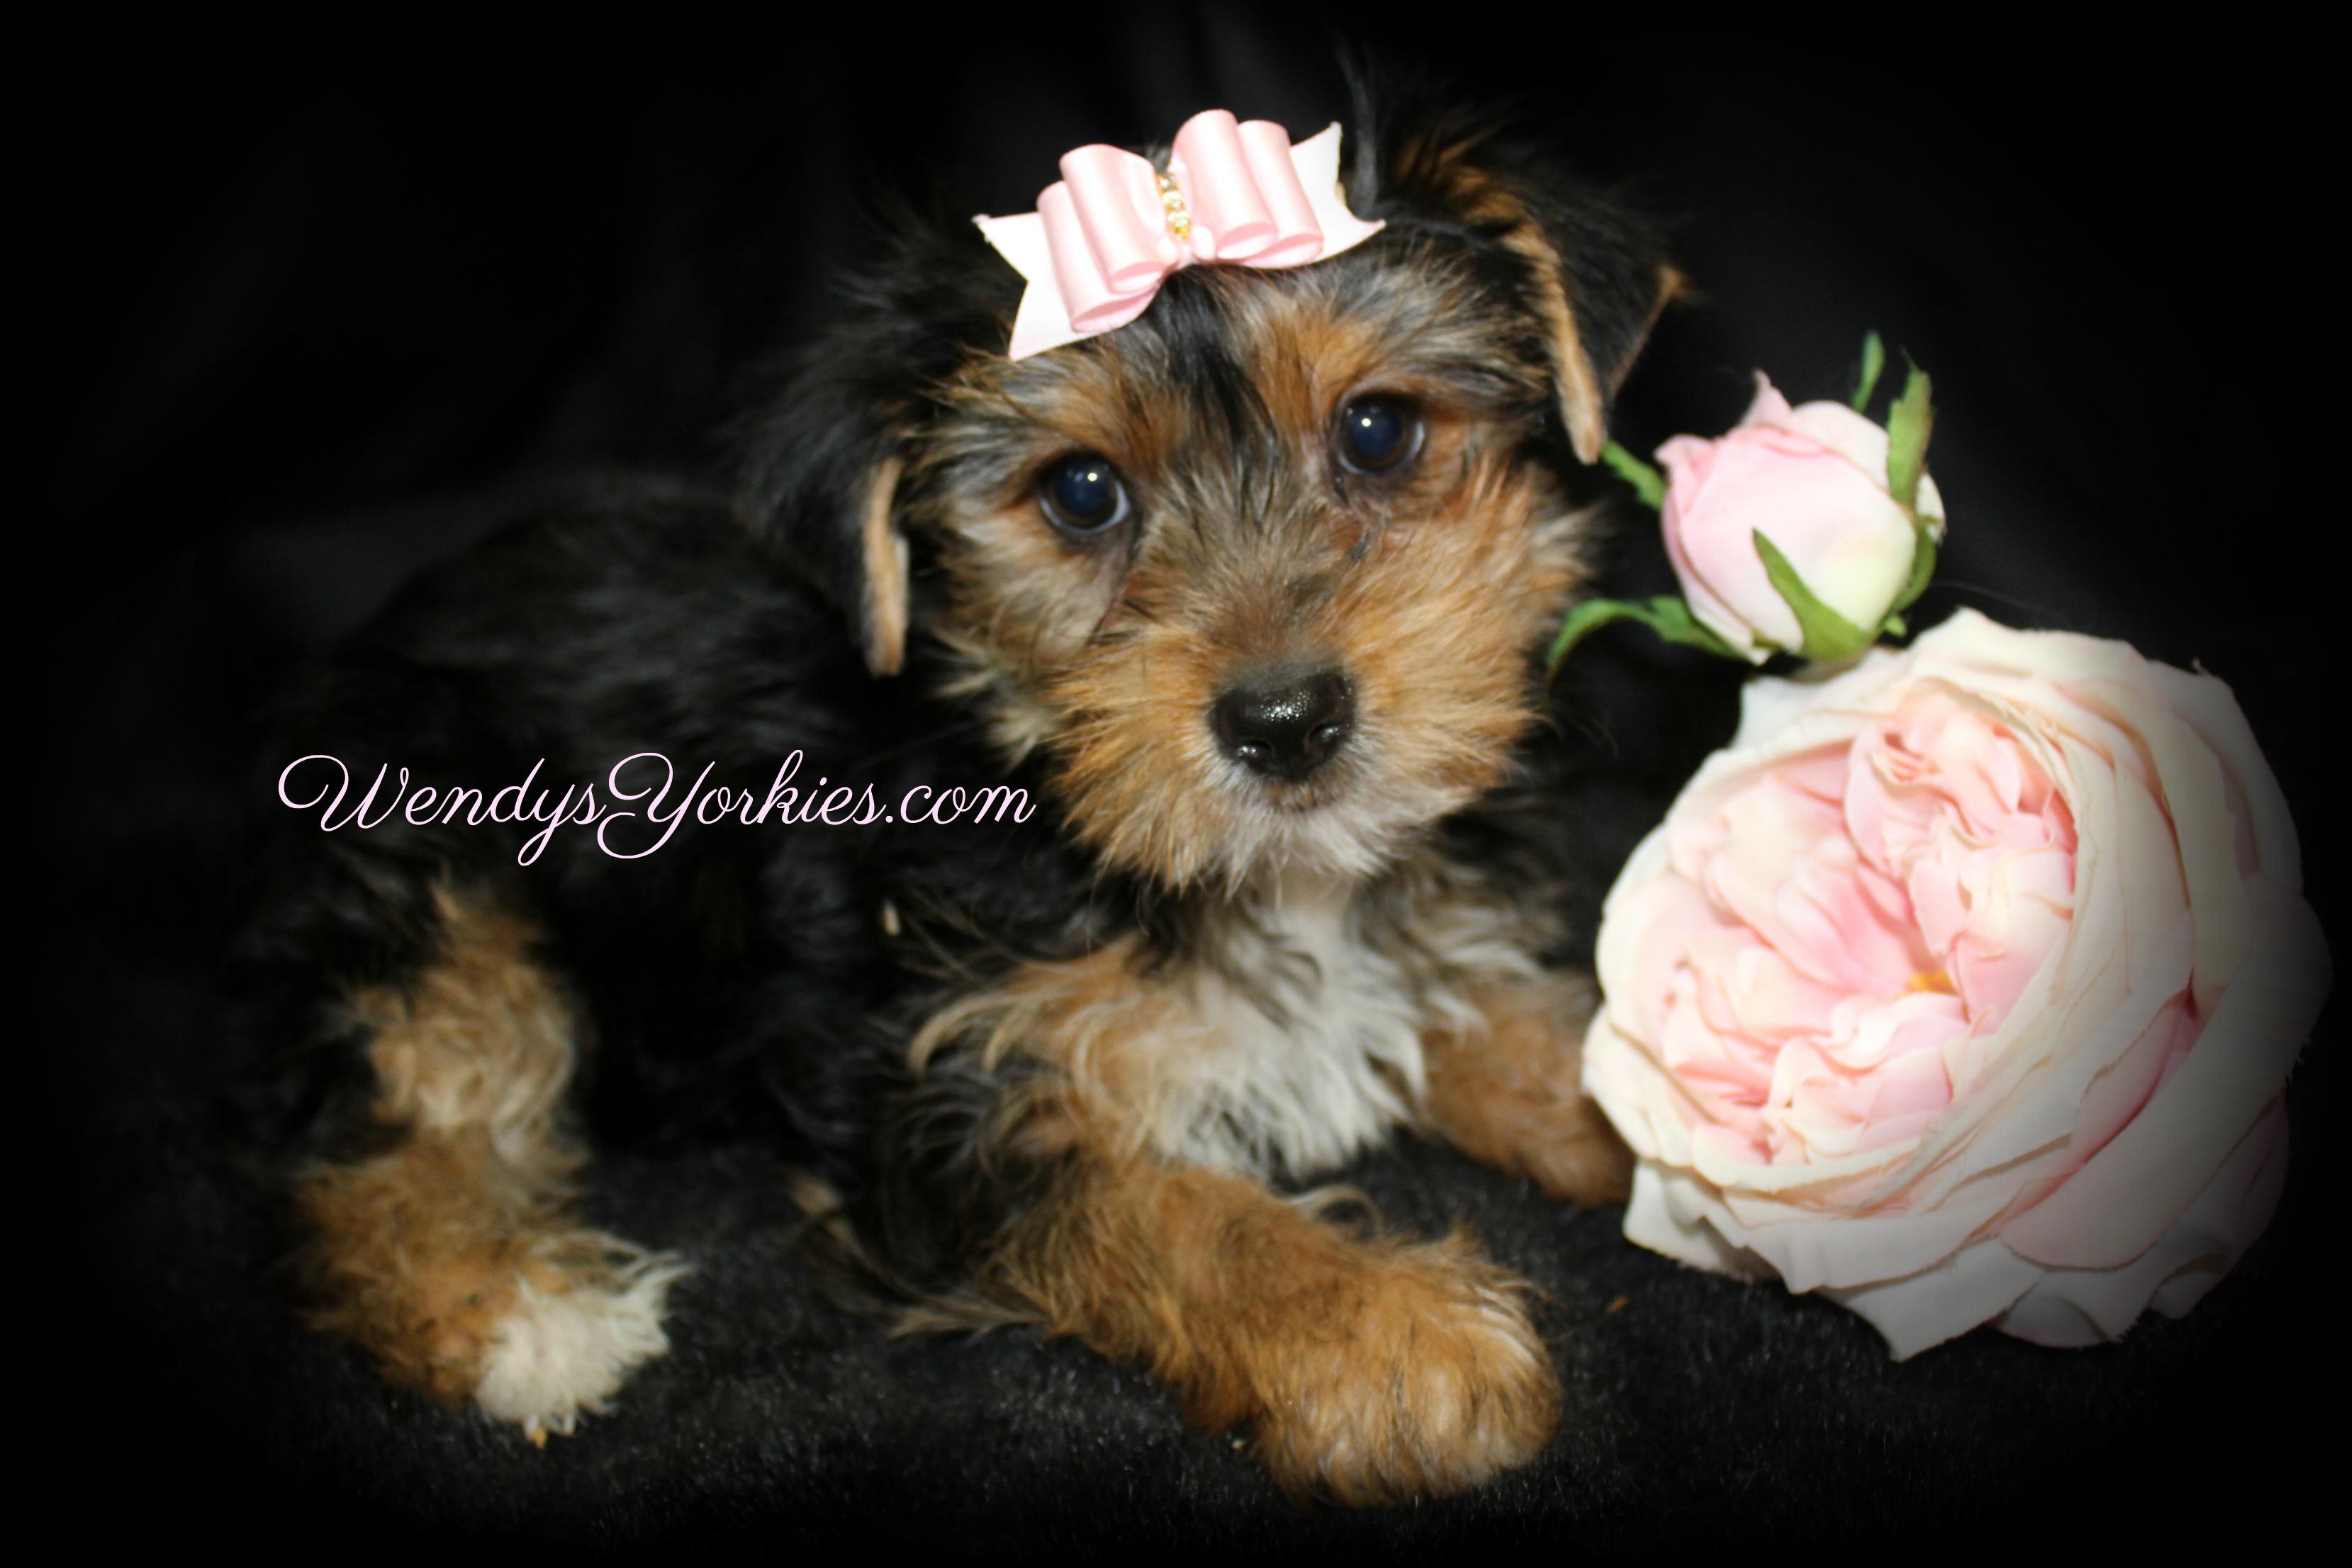 Standard Yorkie puppy for sale, WendysYorkies.com, TH f1